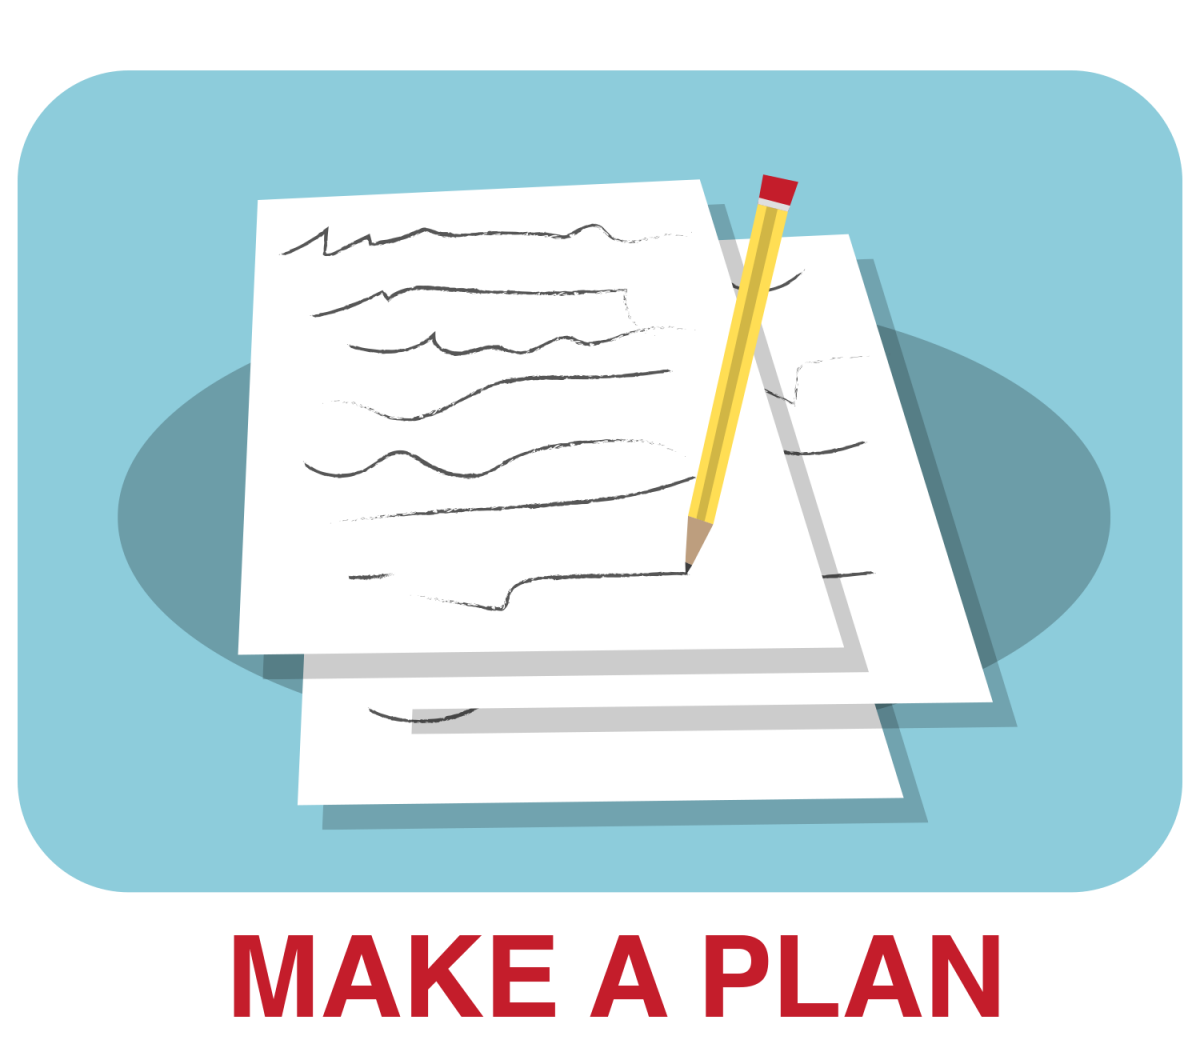 Make A Plan image